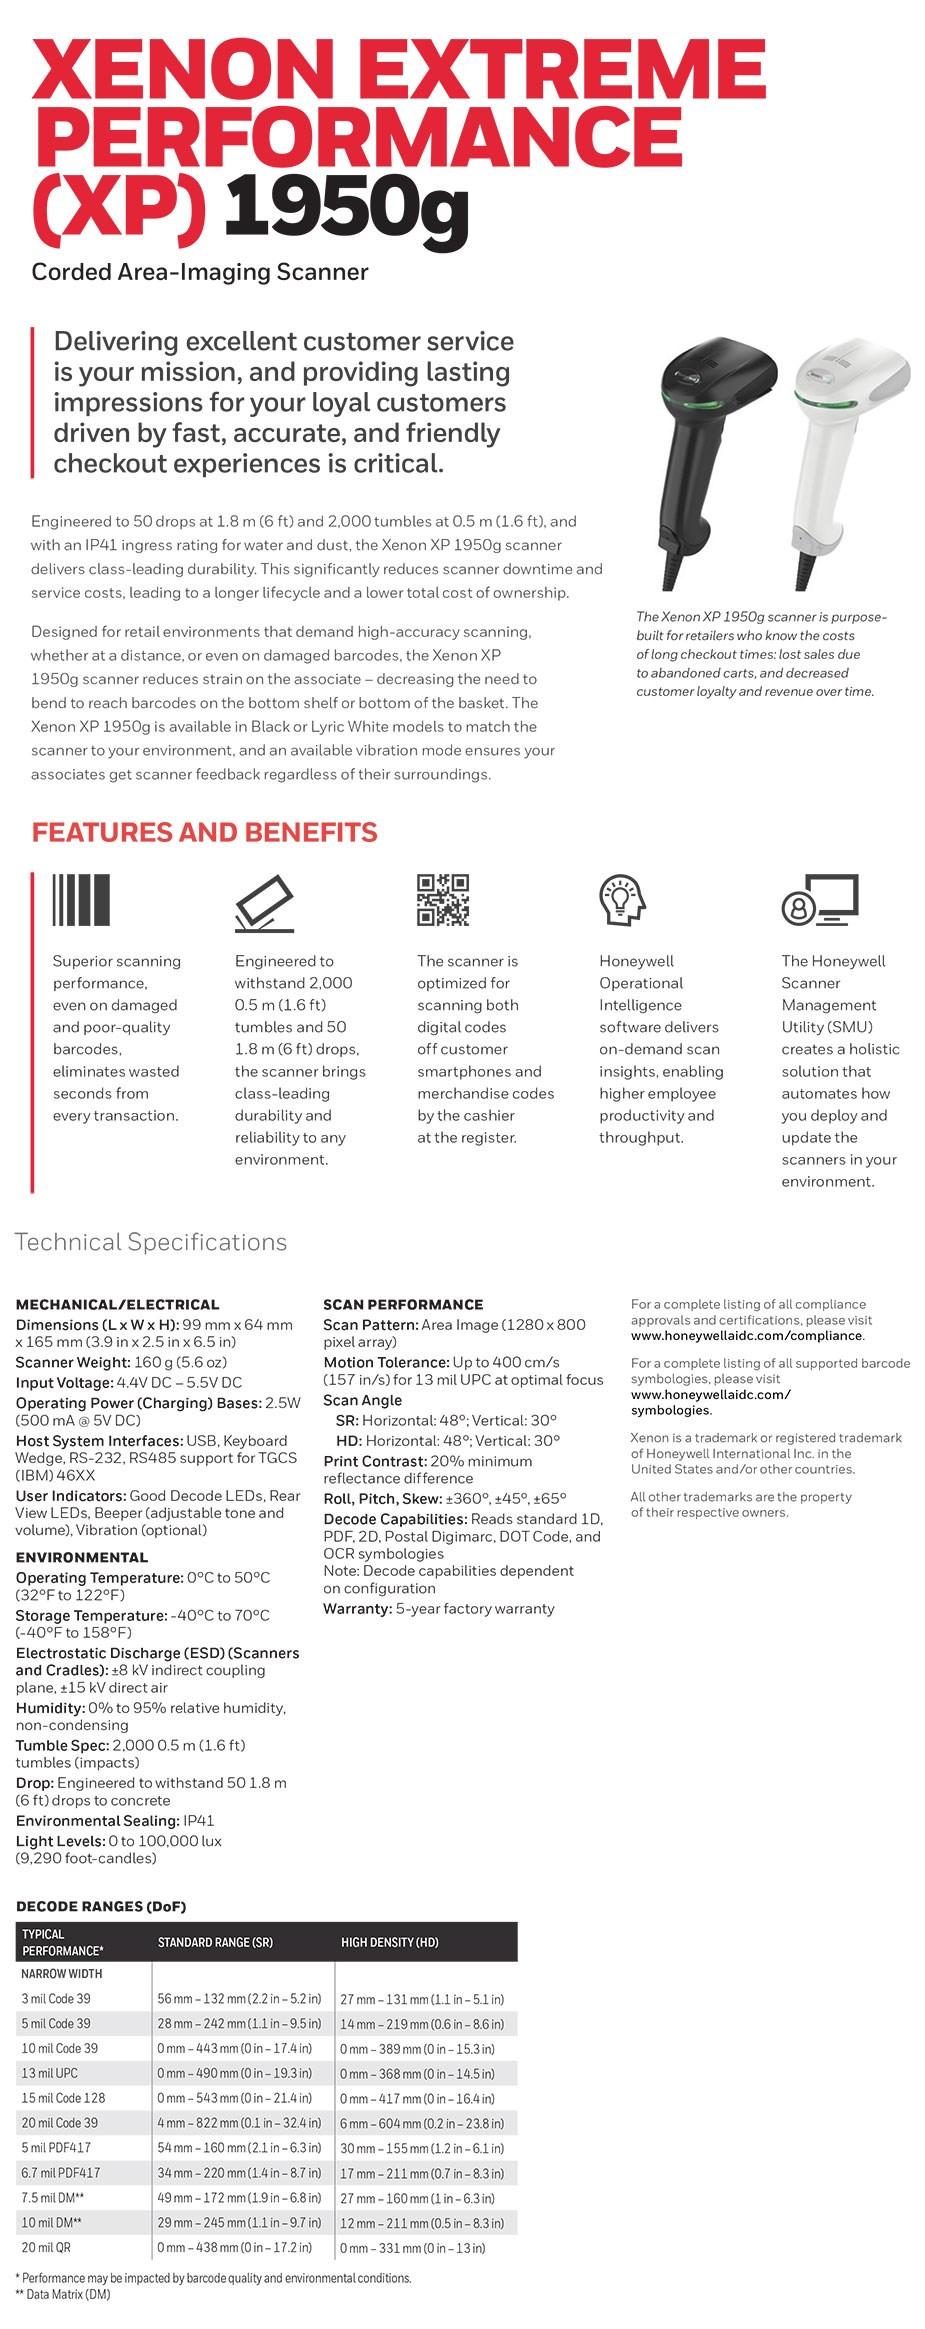 honeywell-xenon-xp-1950g-2d-area-image-barcode-scanner-kit-black-ac32122-1.jpg